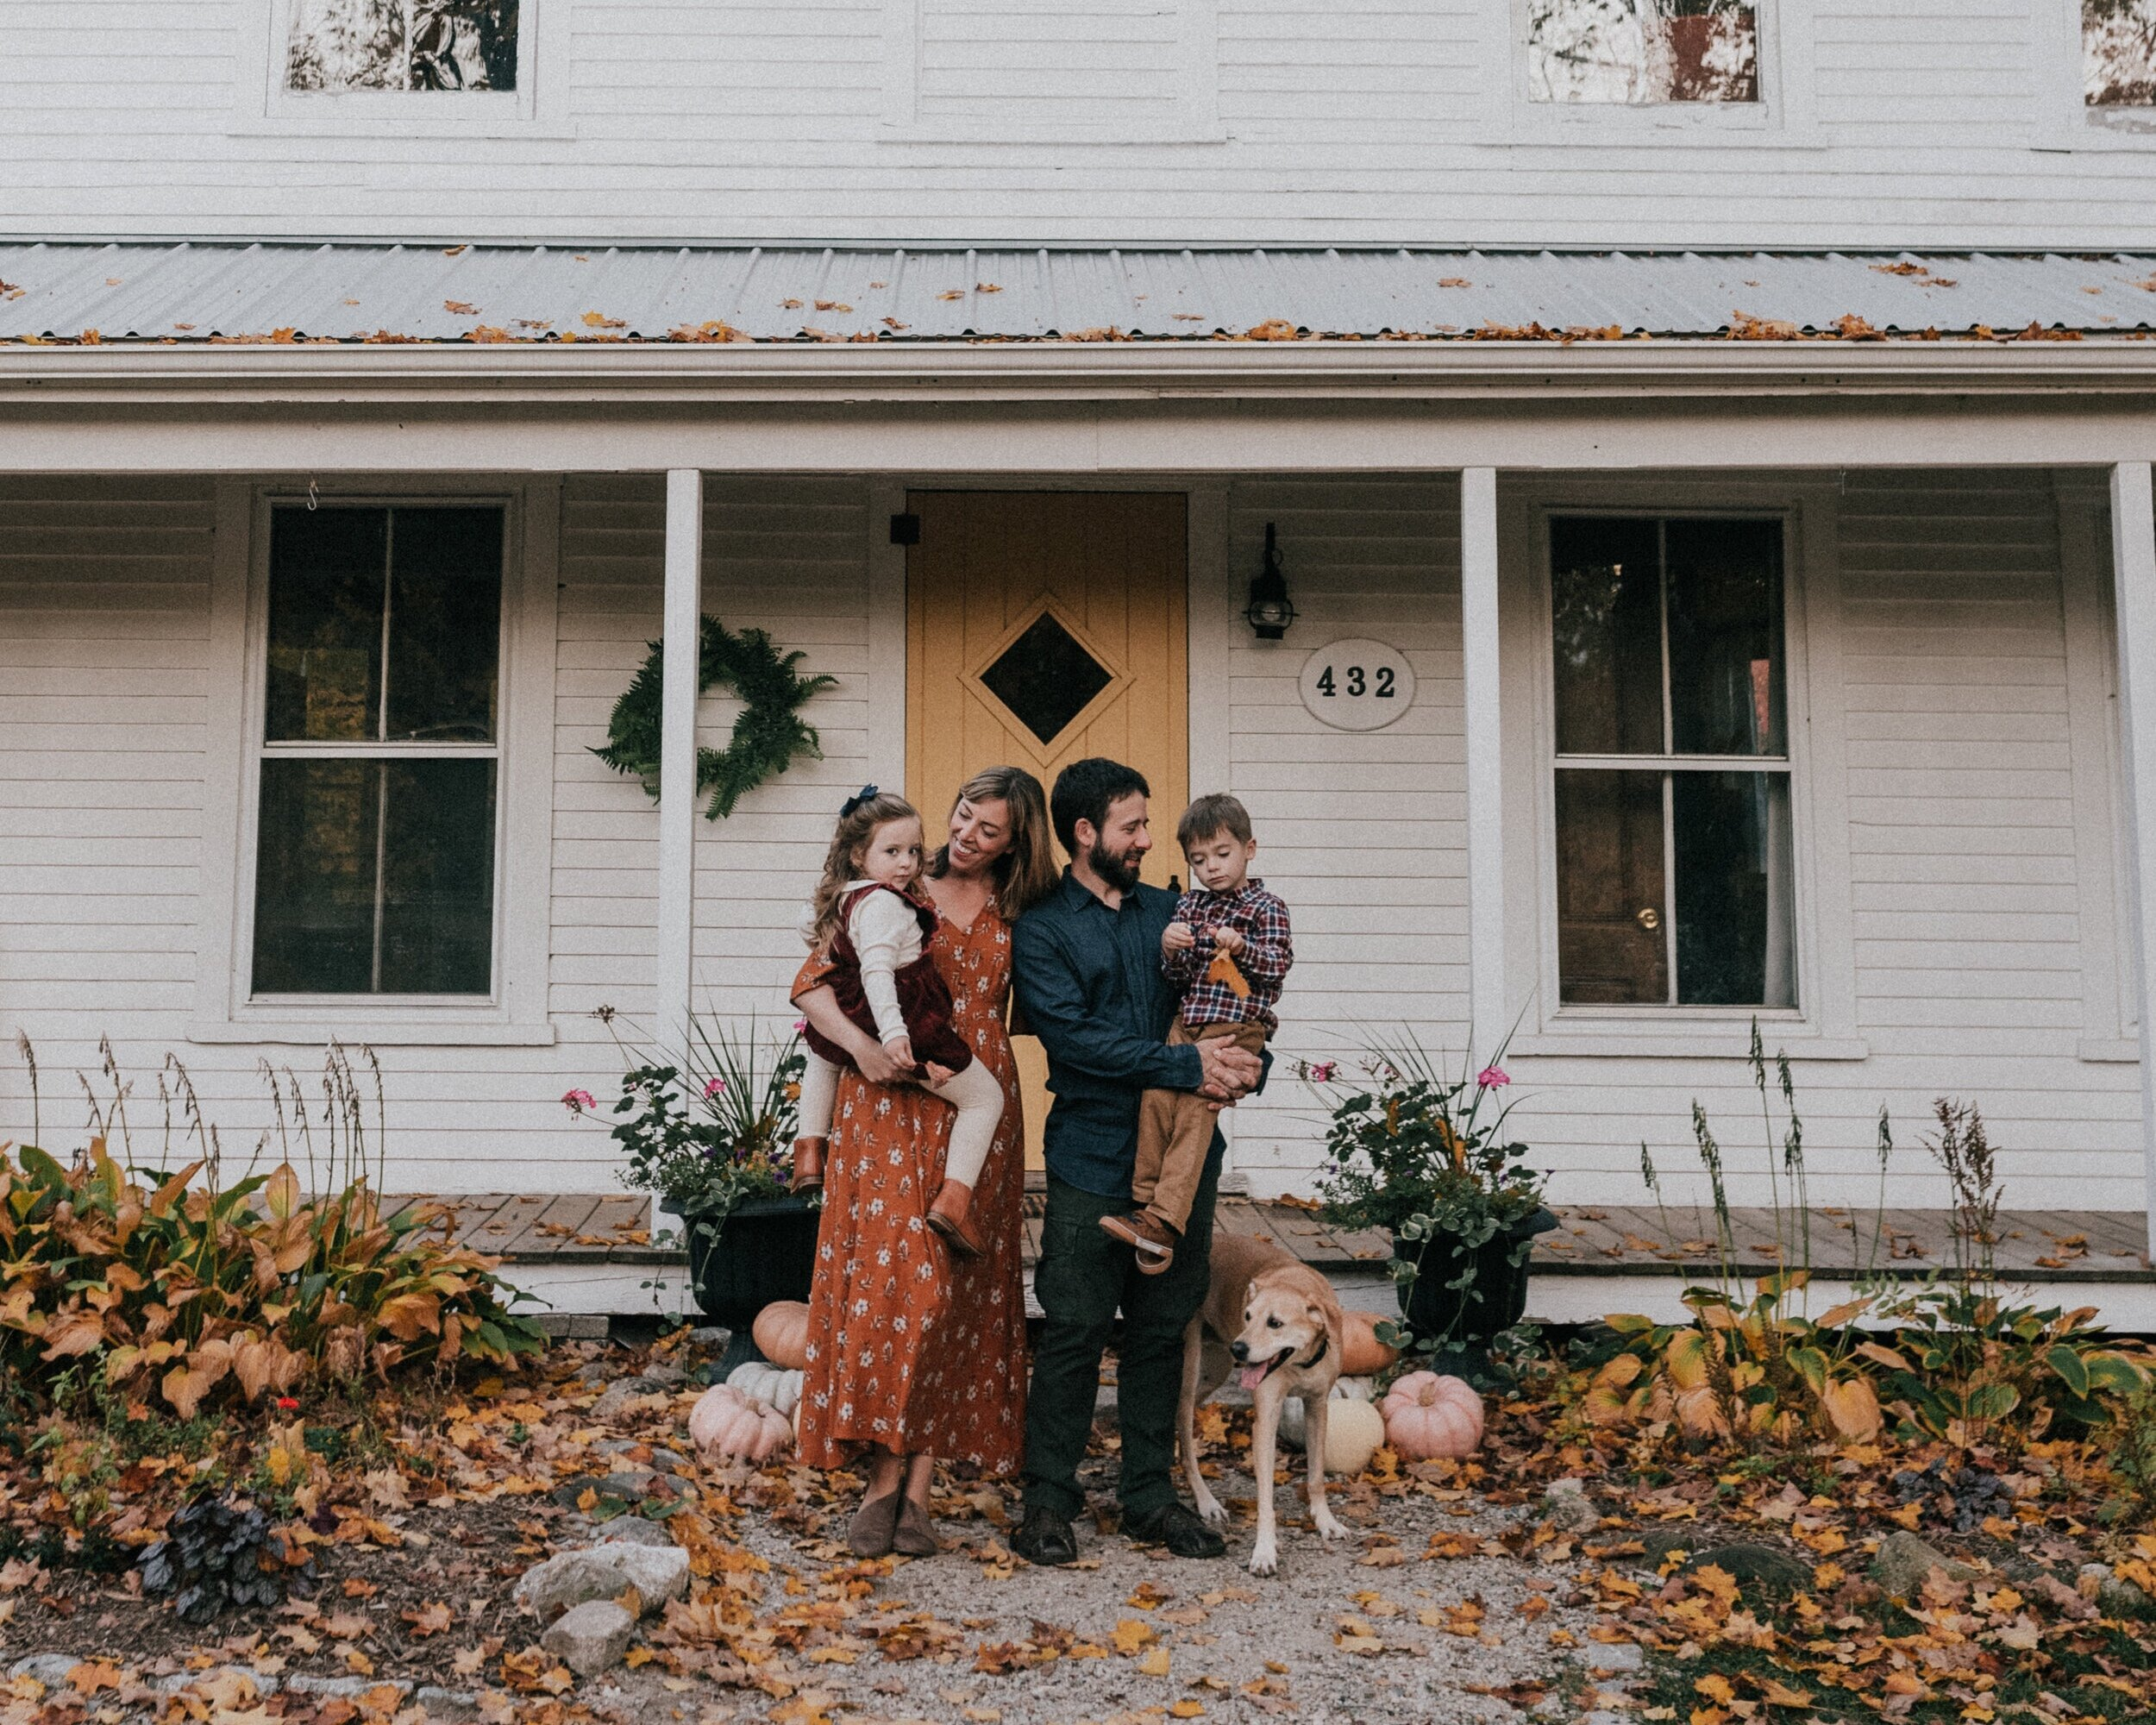 CodyJamesBarryPhotography_GardenGateFamilyShoot-11.jpg